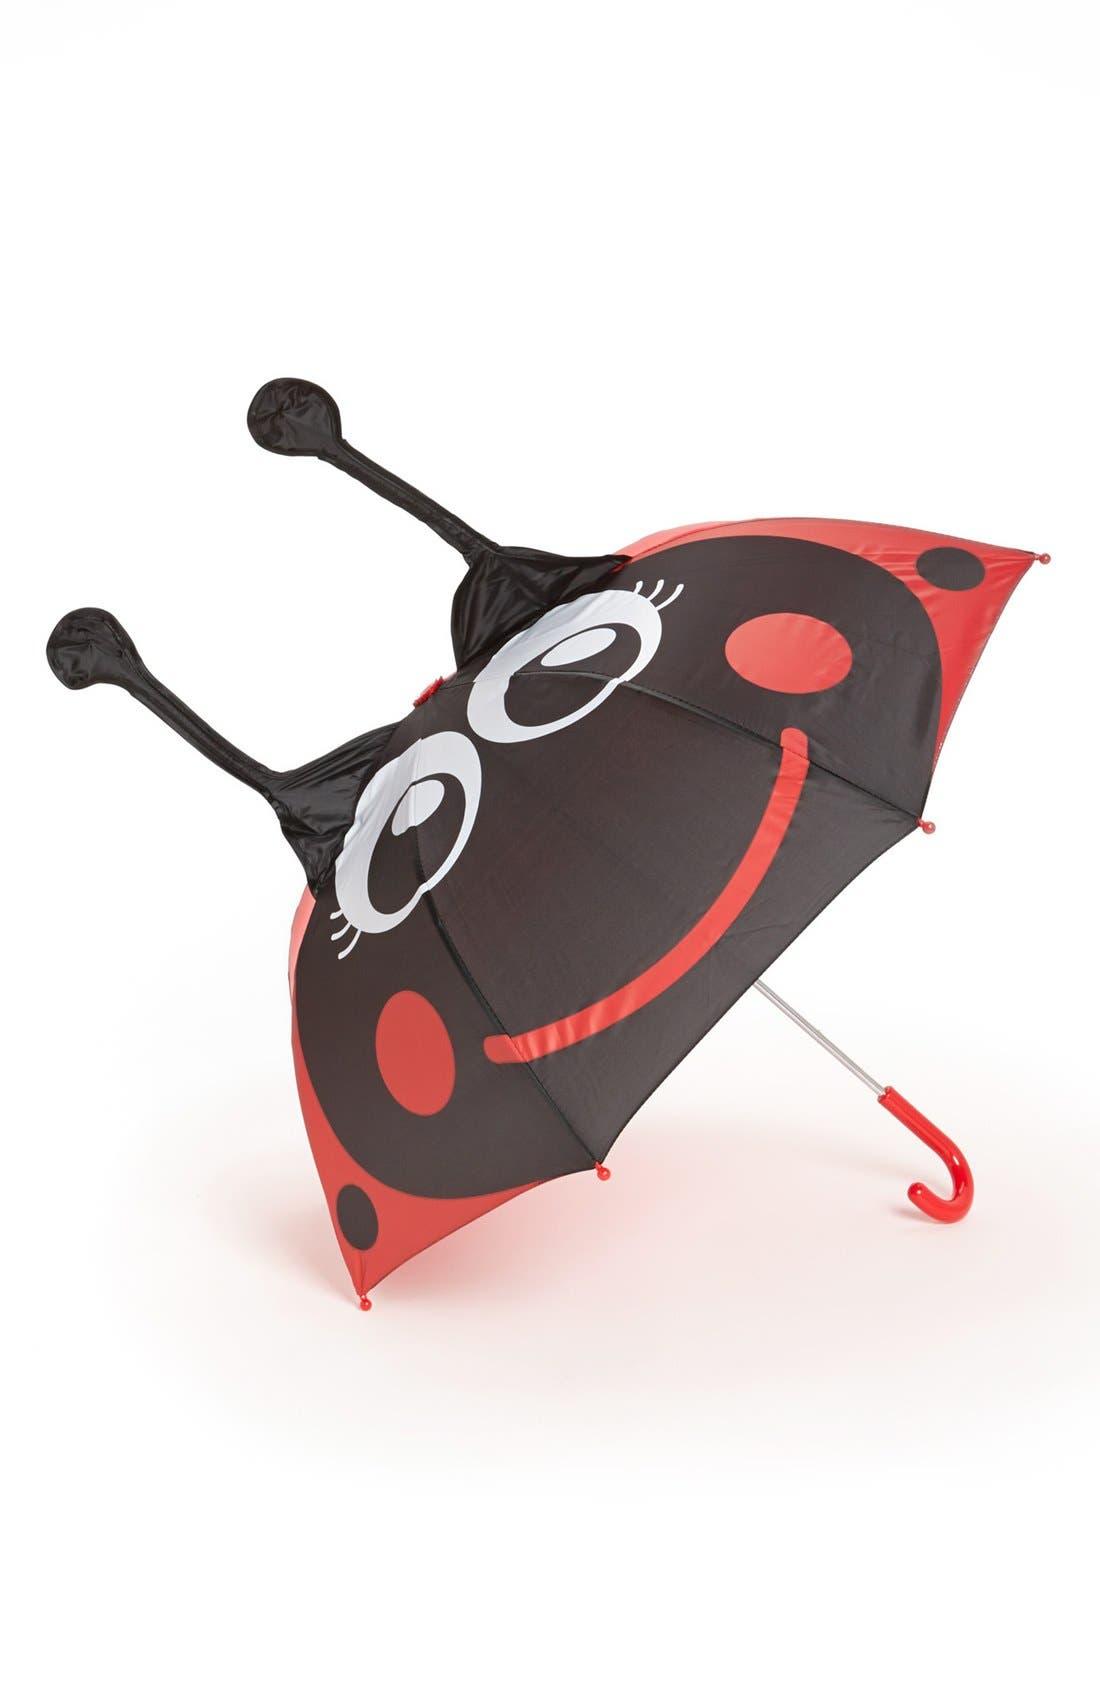 Alternate Image 1 Selected - Western Chief 'Ladybug' Umbrella